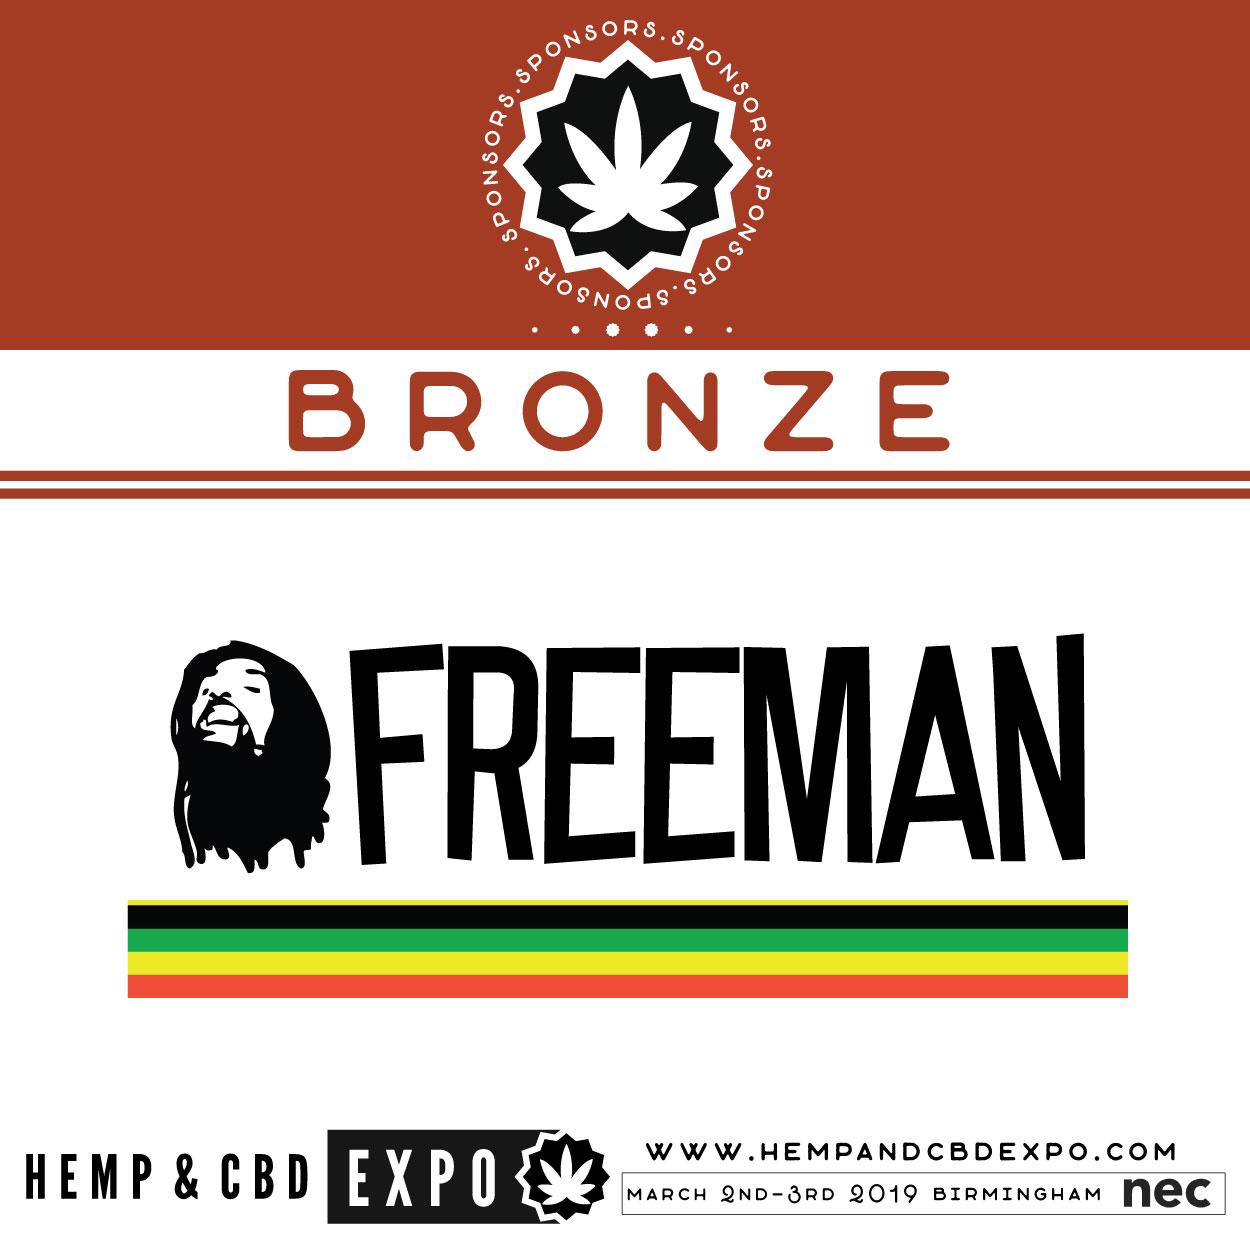 bronze-freeman